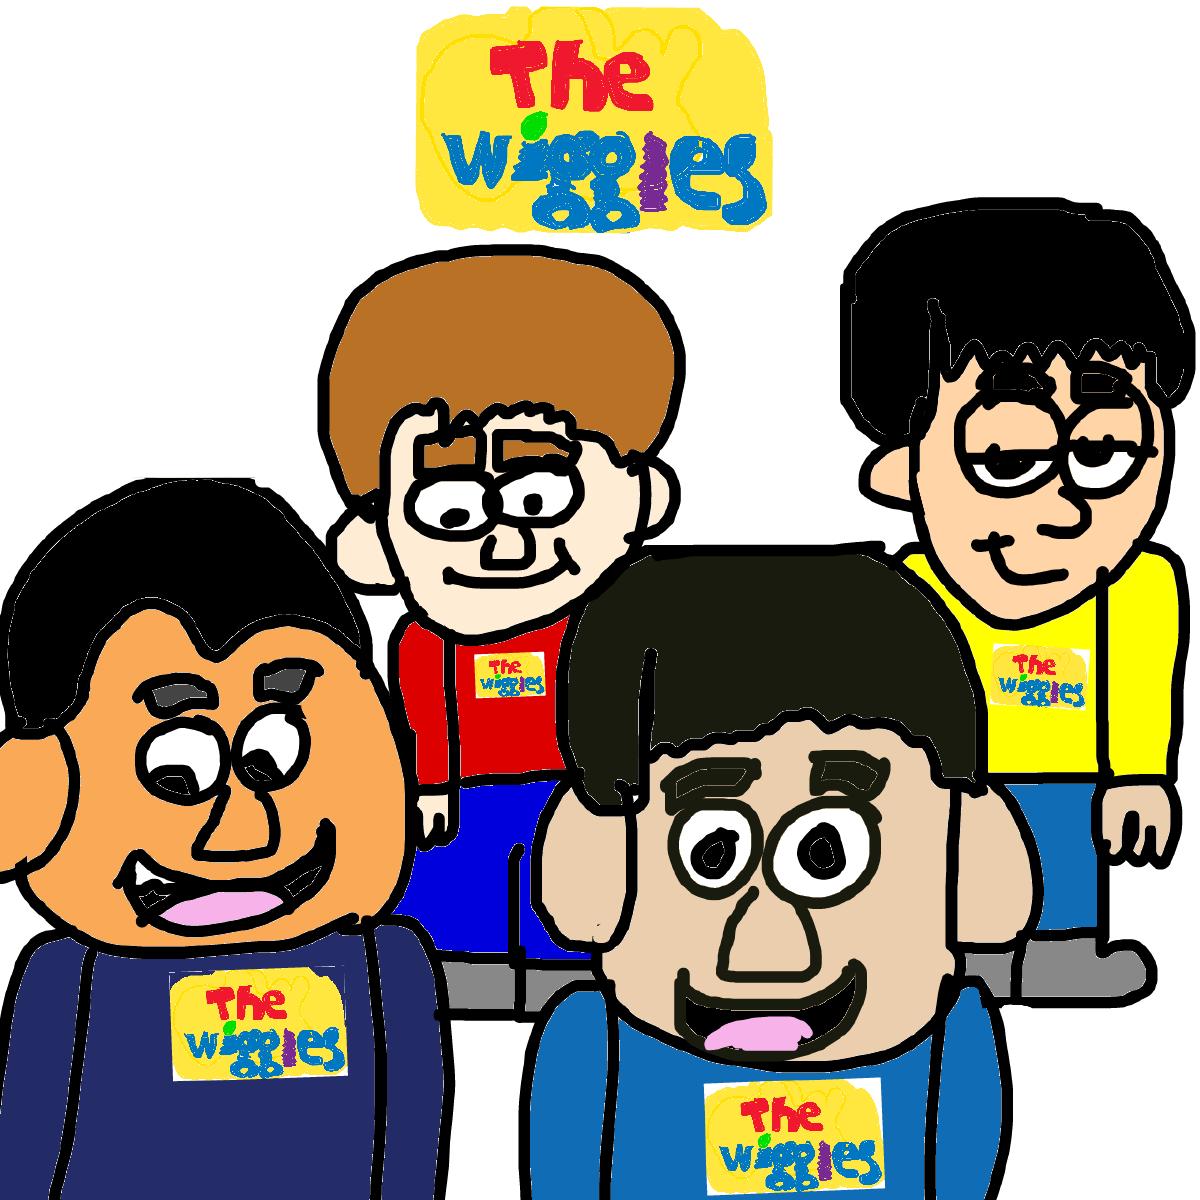 The Wiggles by Dariusman143